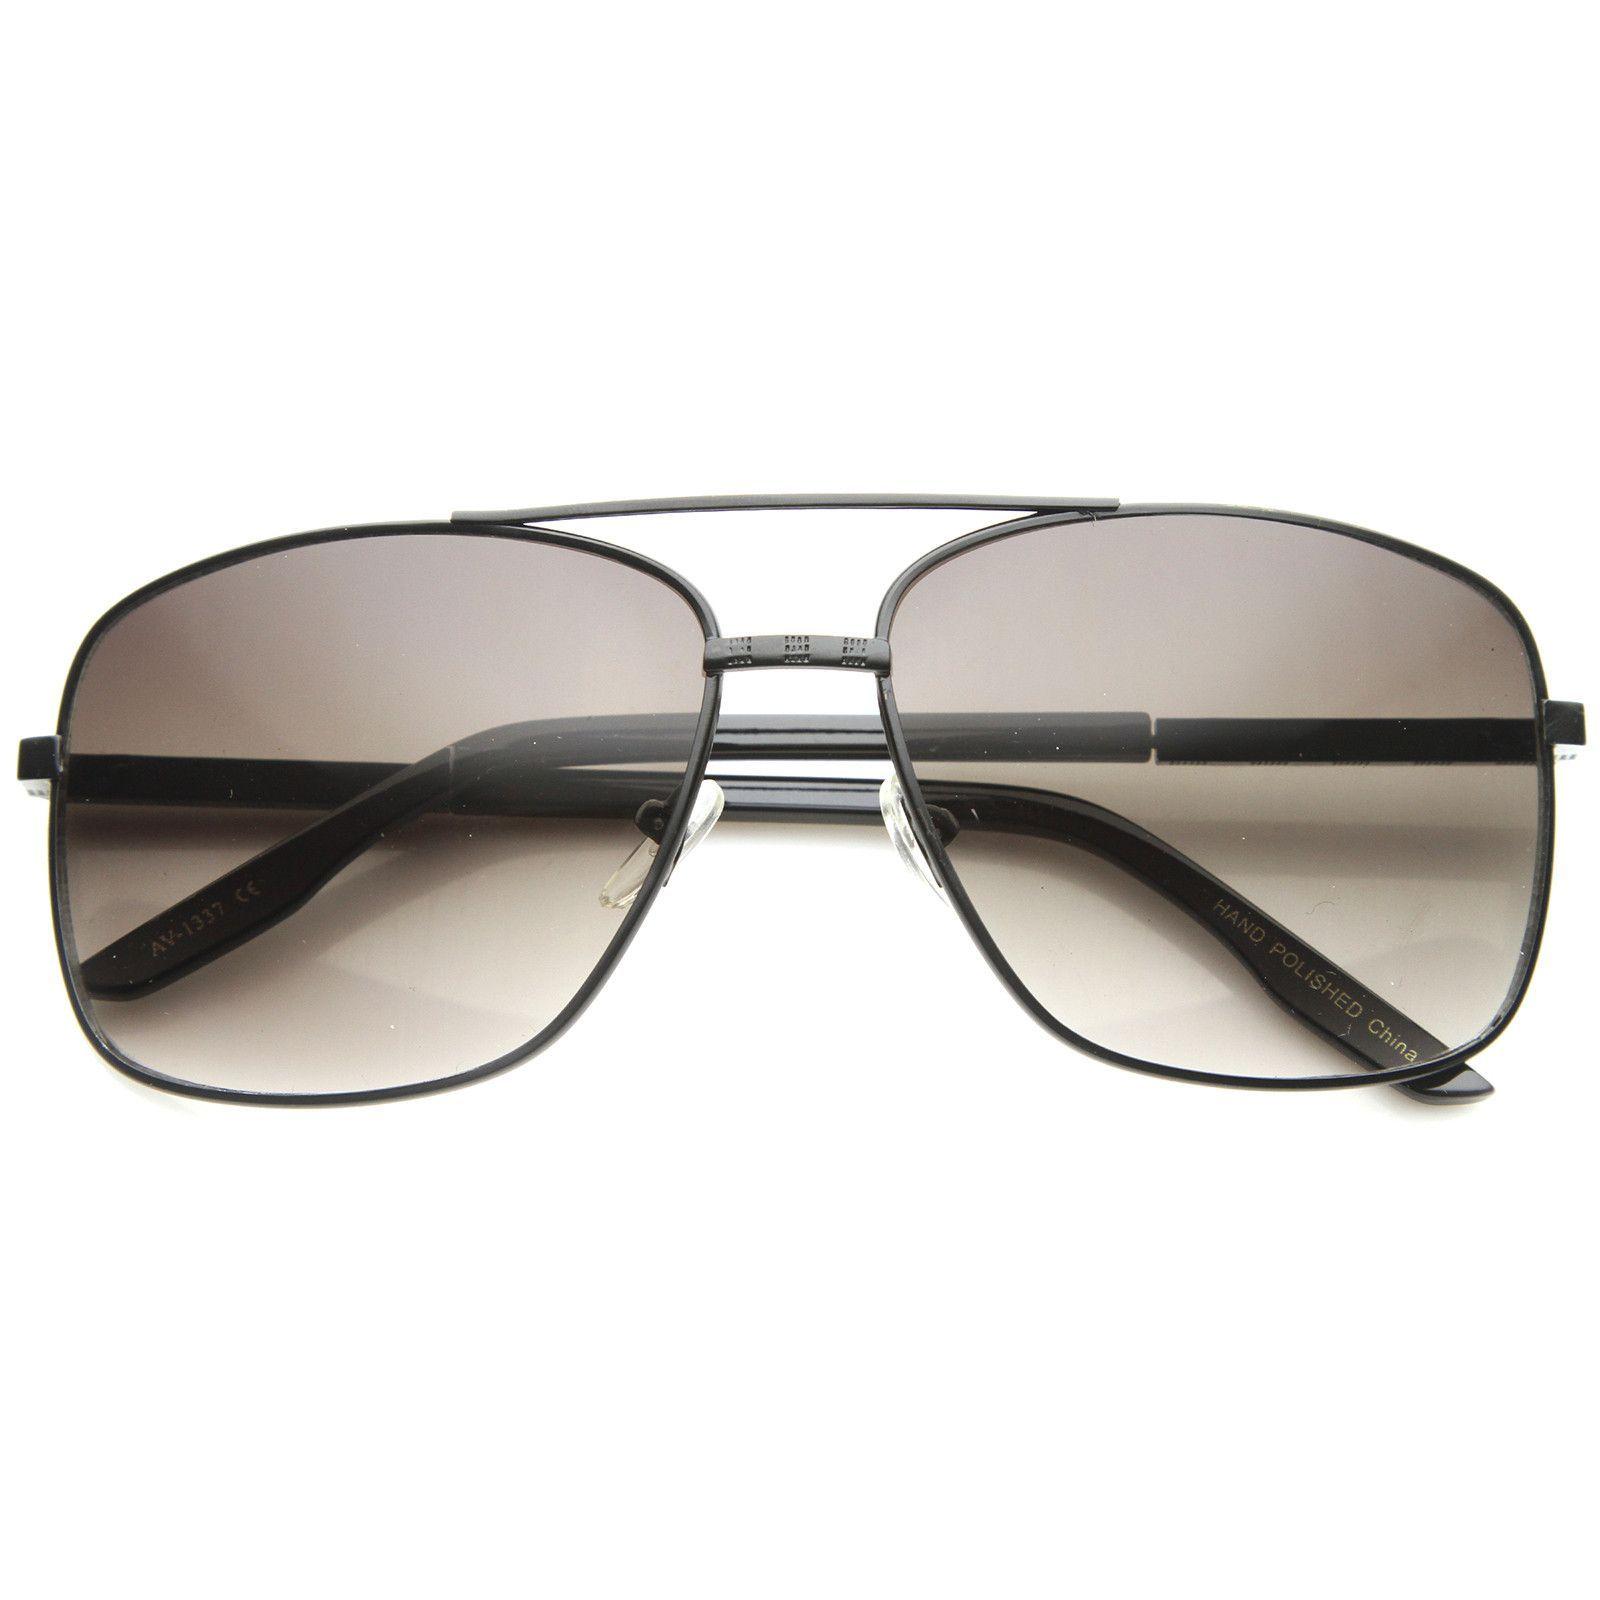 Mens Metal Aviator Sunglasses With UV400 Protected Gradient Lens